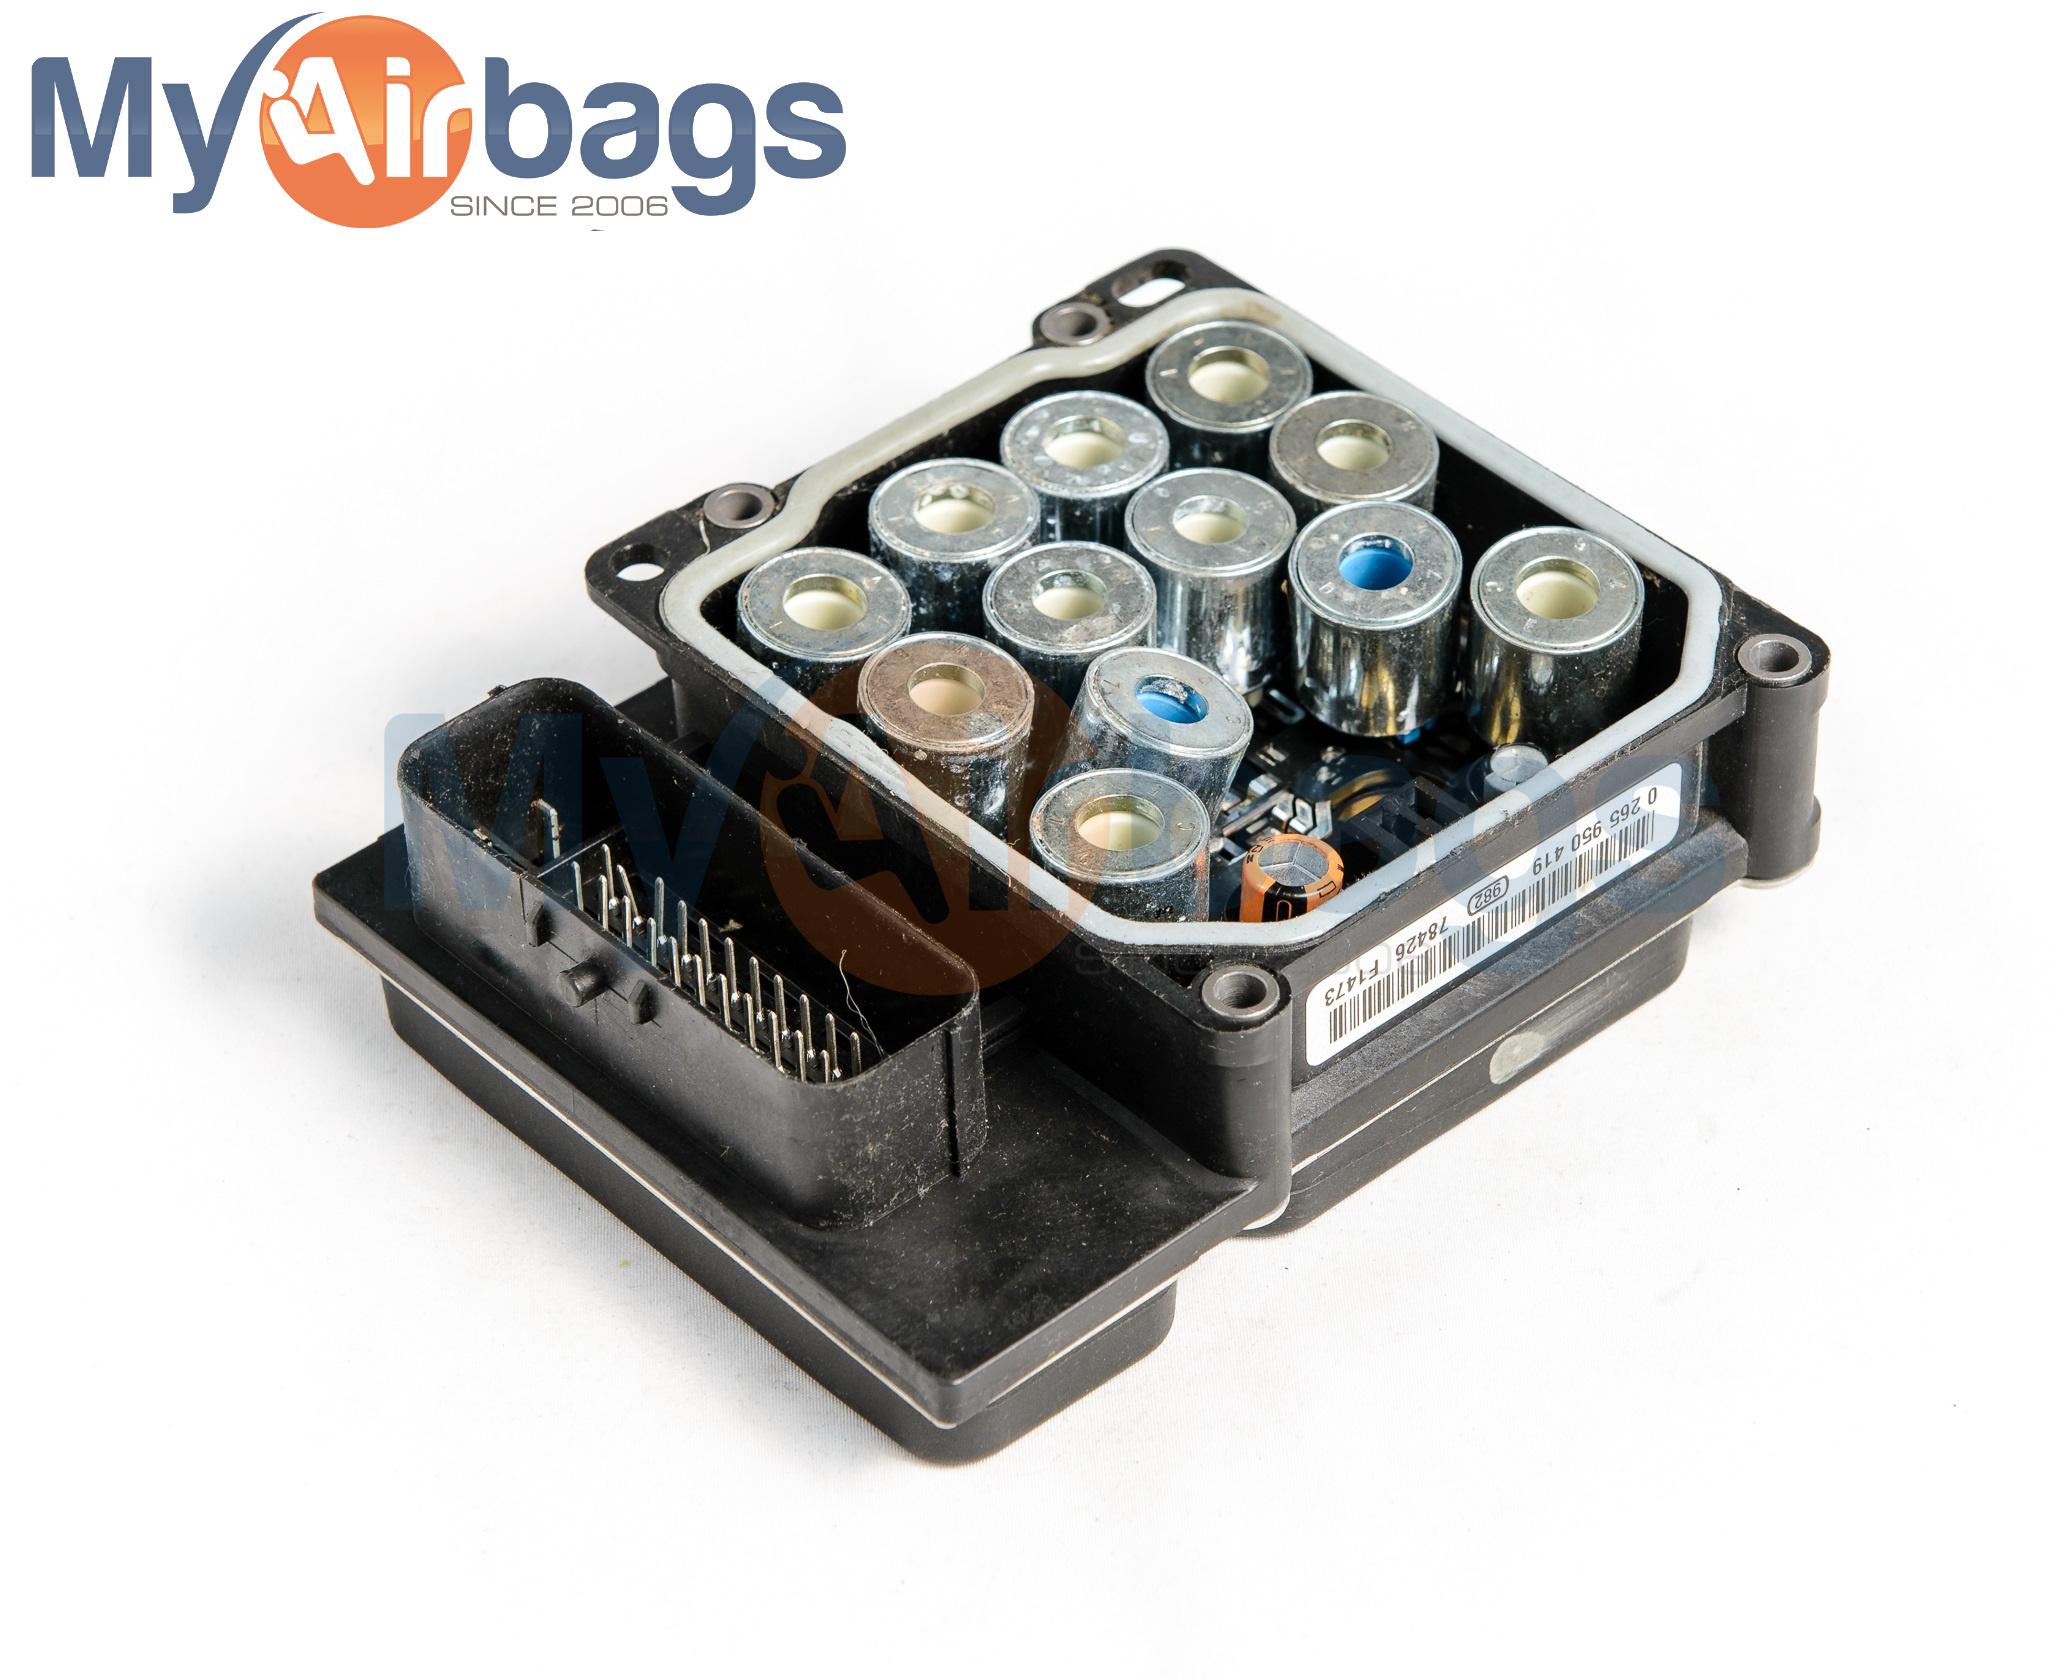 MyAirbags-ABS-Module-BOSCH-8.0-Img1